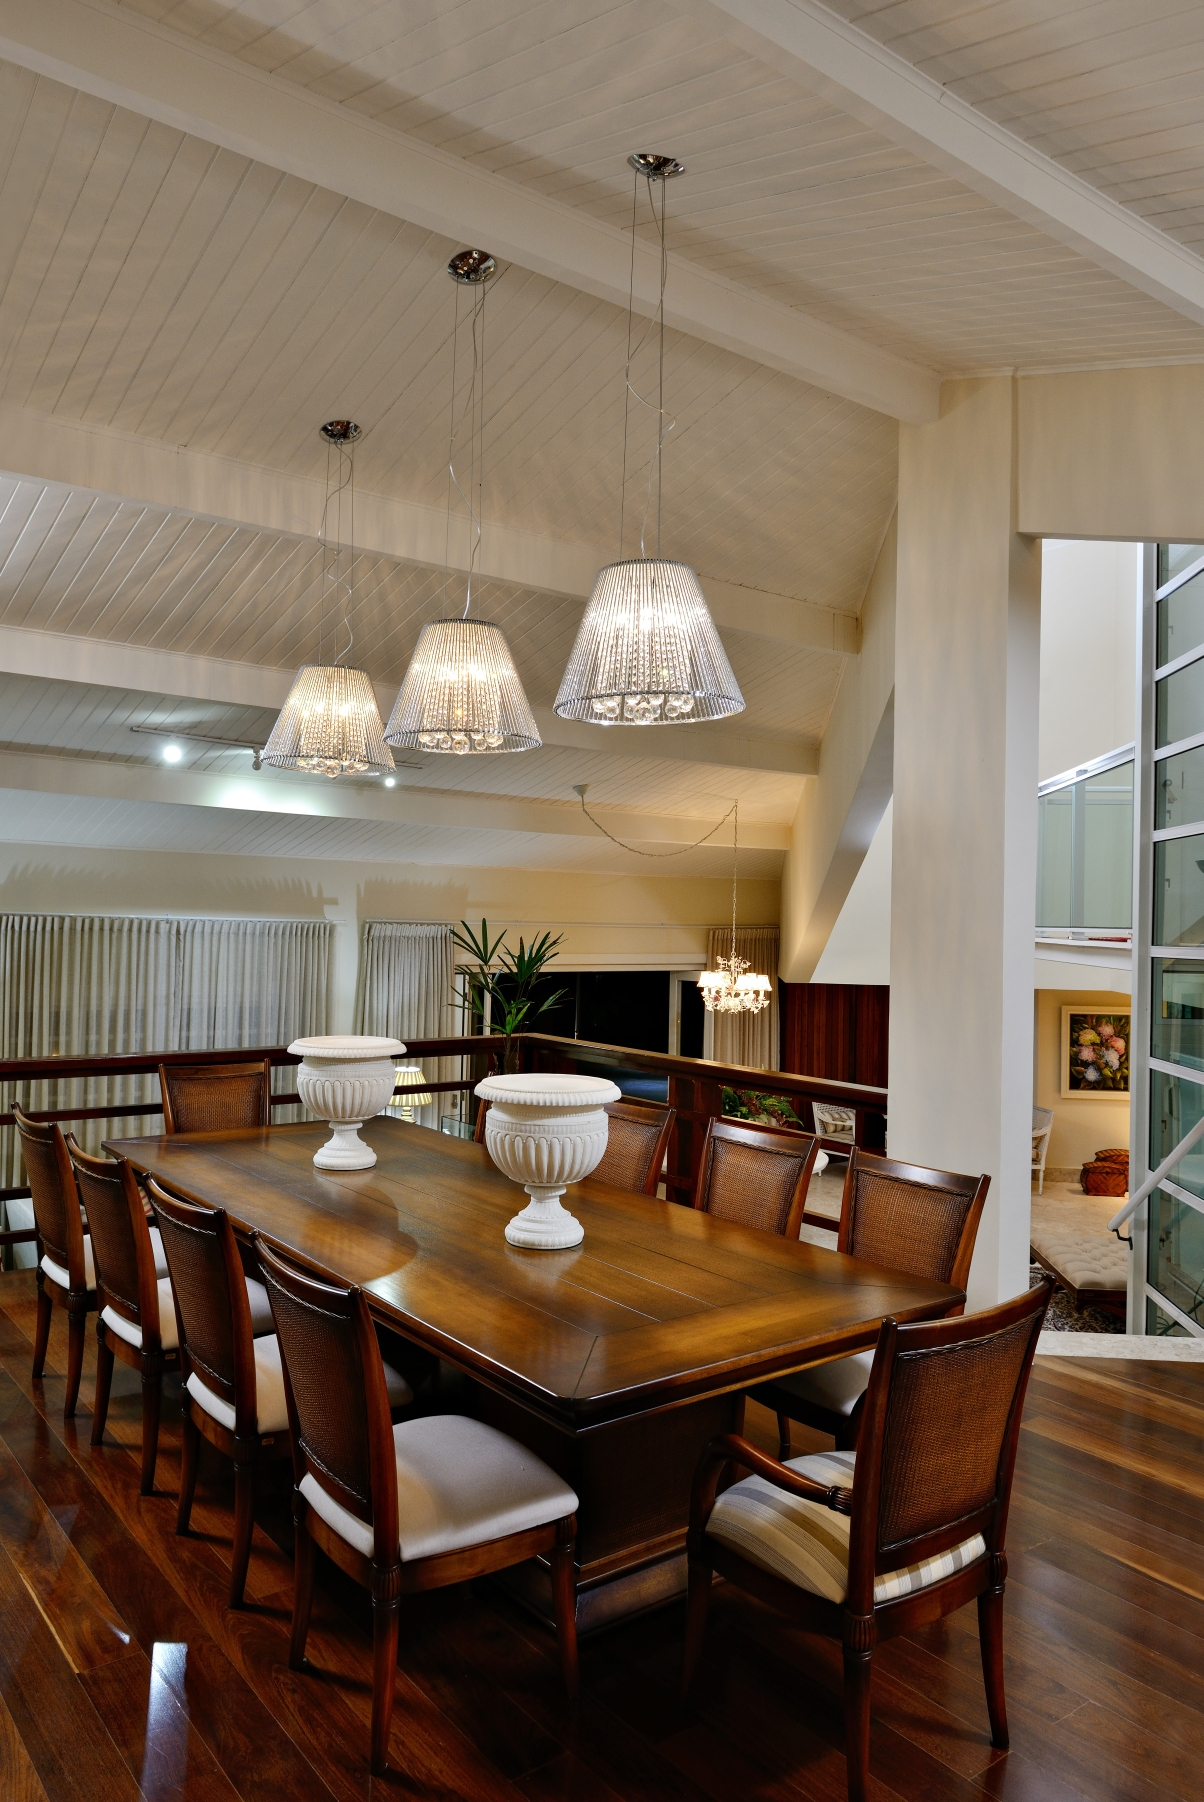 Sala de Jantar com lustre triplo